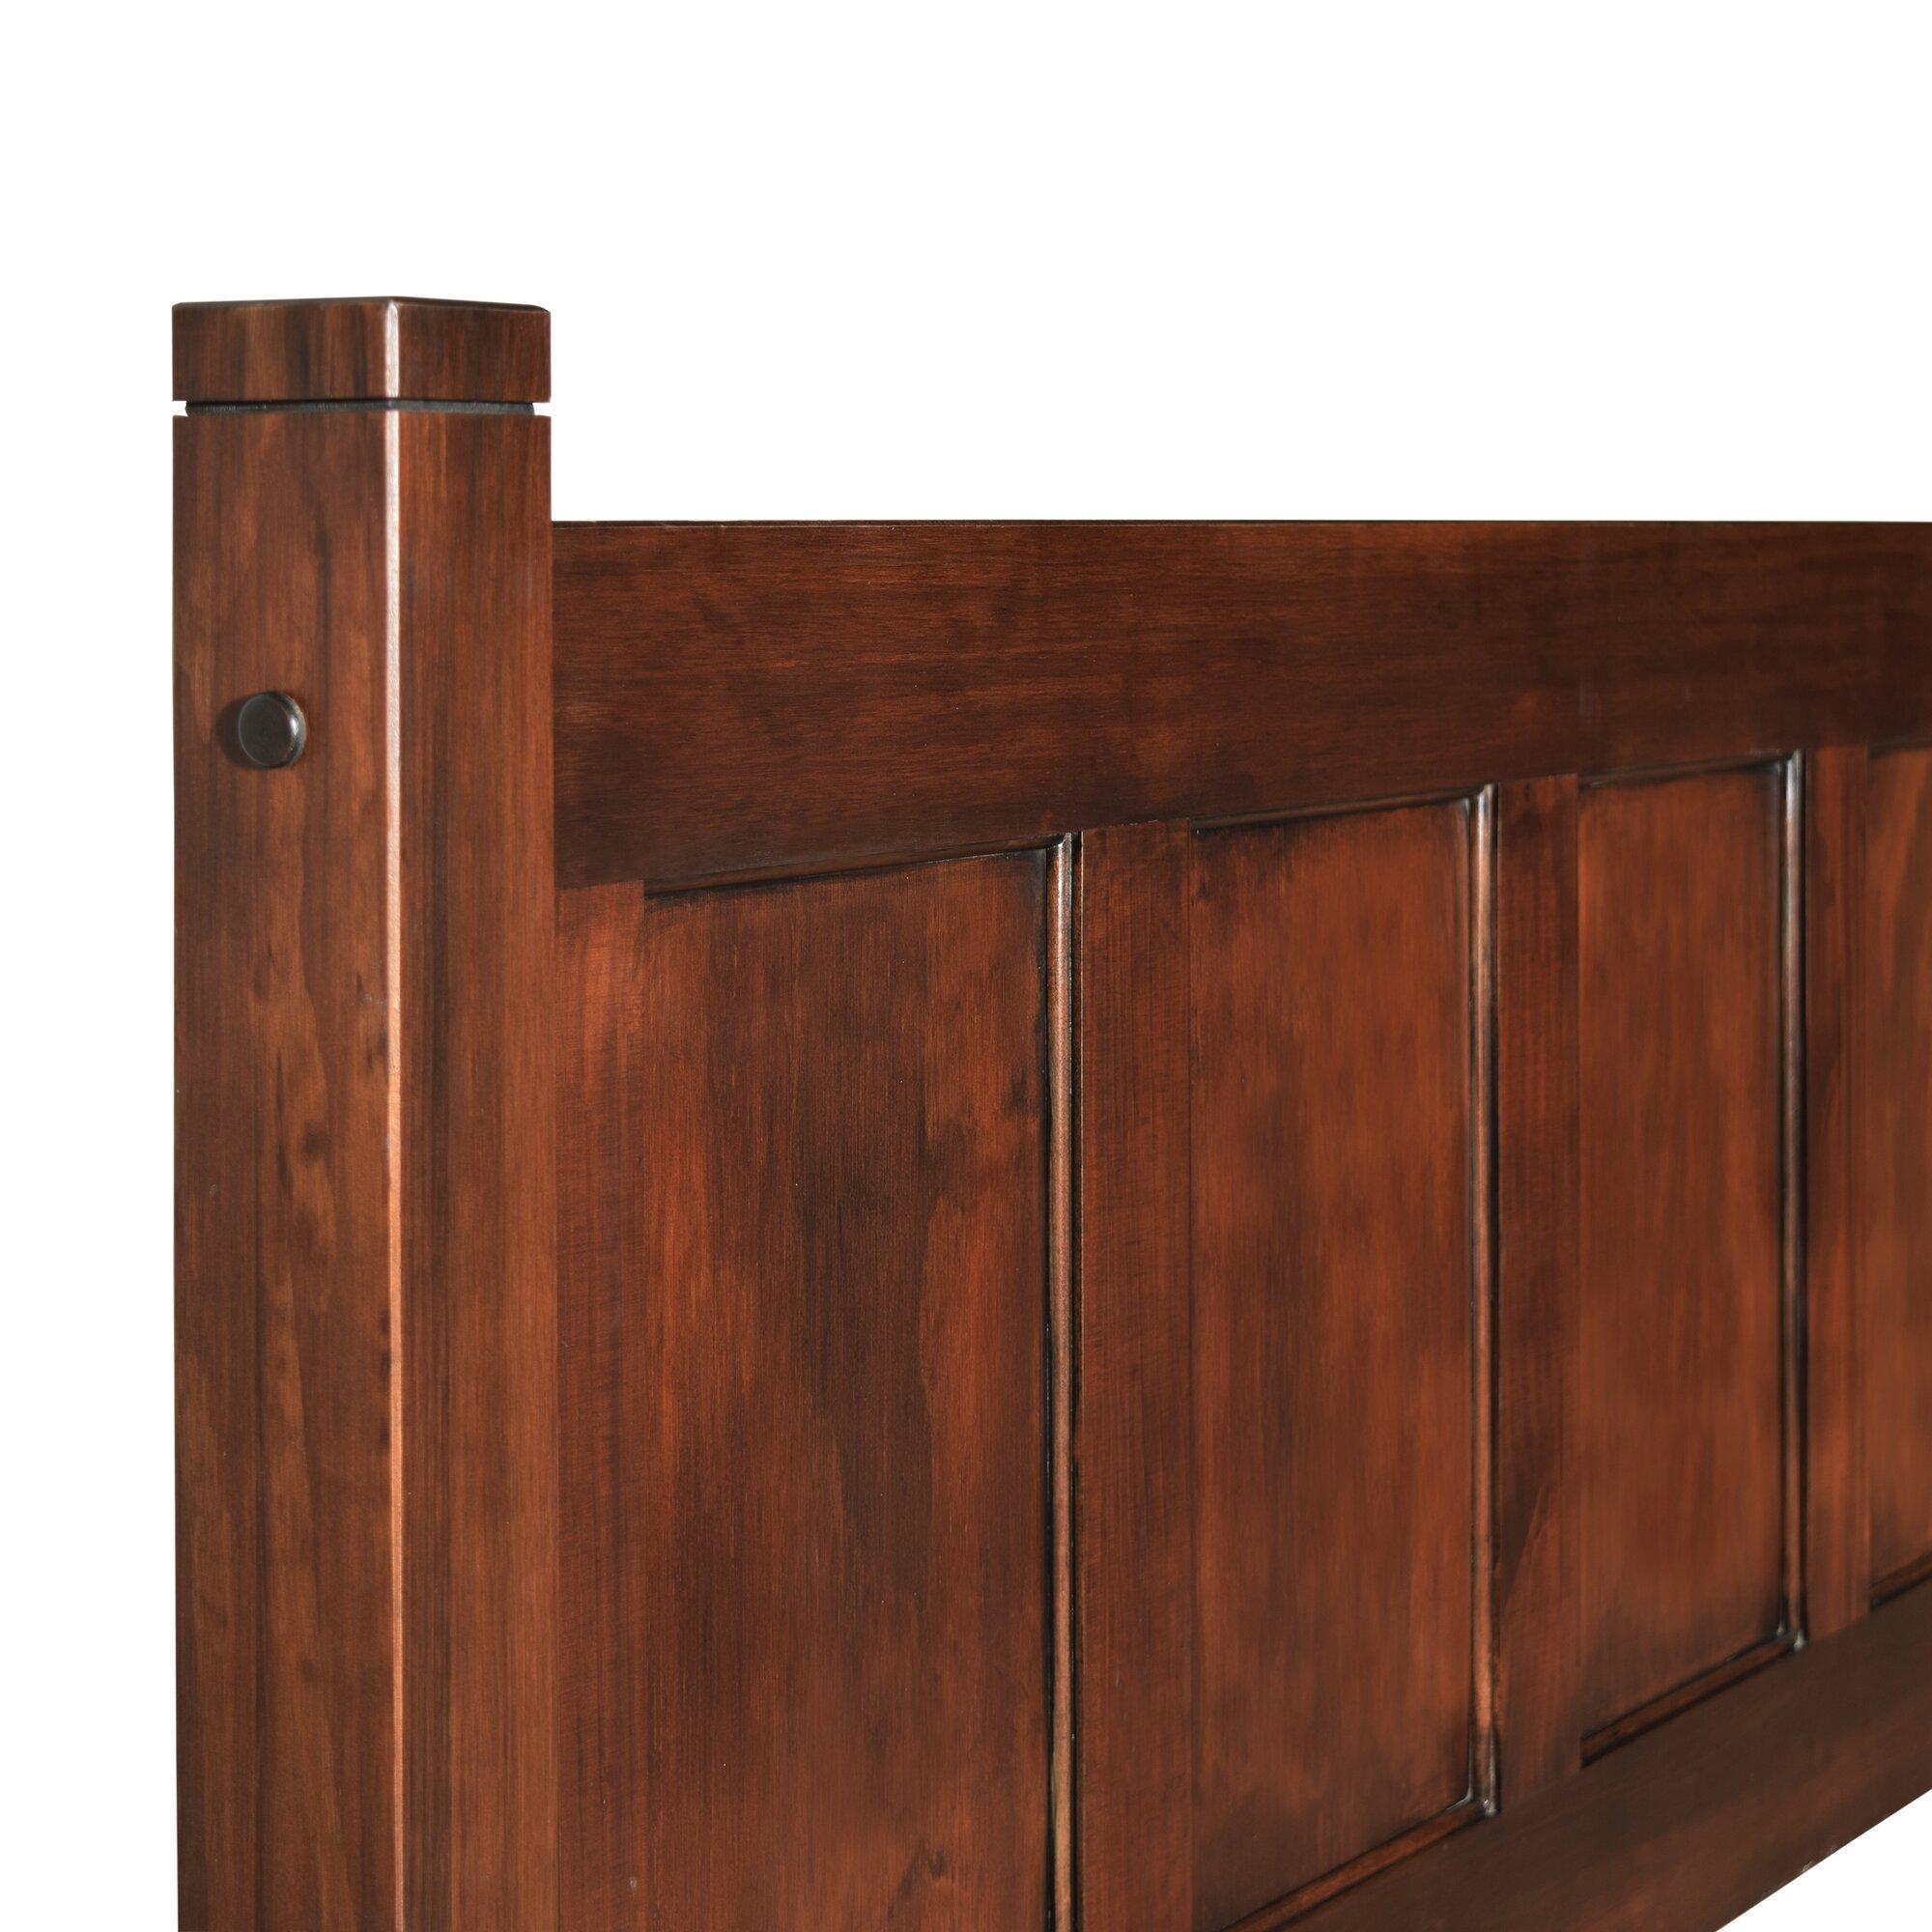 Grain Wood Furniture Shaker Platform Bed  Reviews Wayfair - Online shaker style bedroom furniture